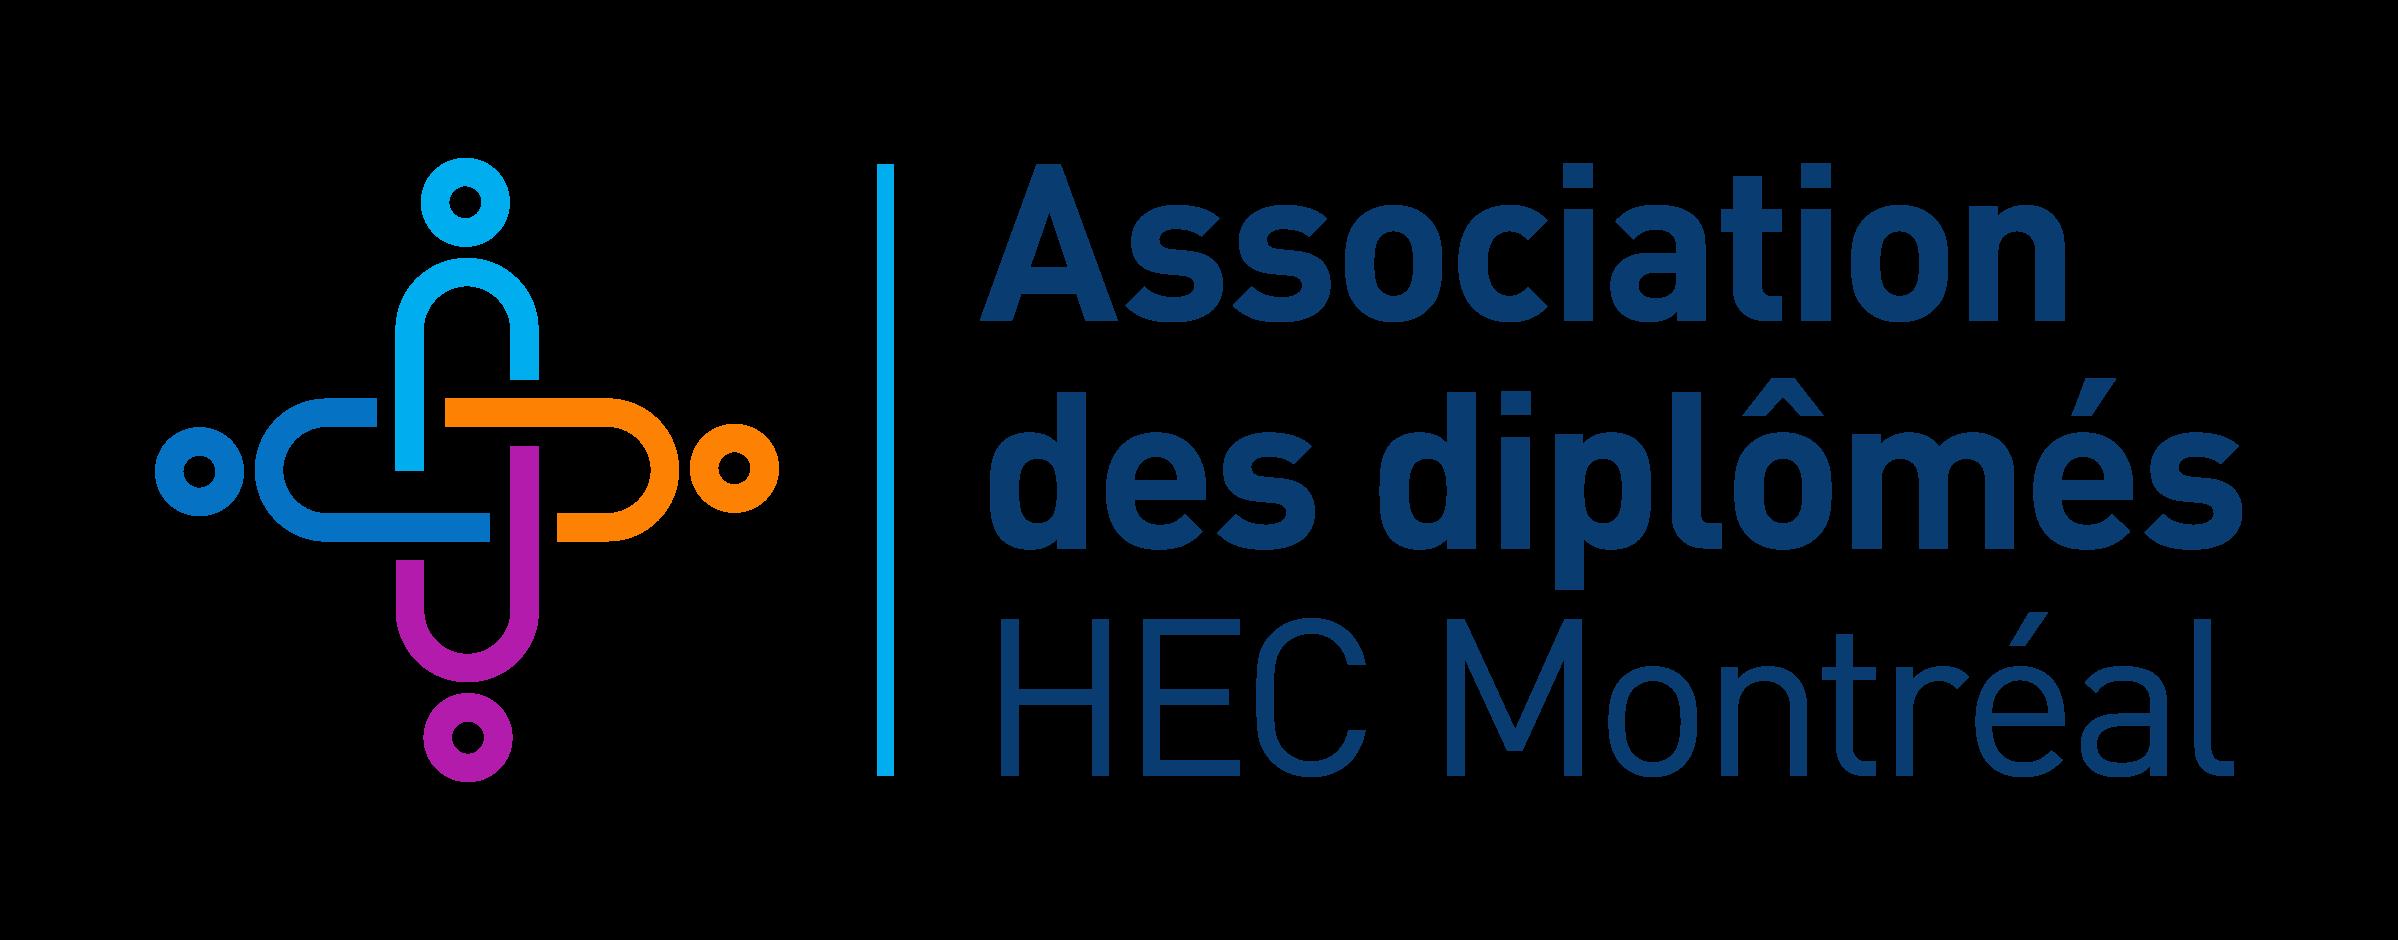 Logo - HEC Montréal Alumni Association